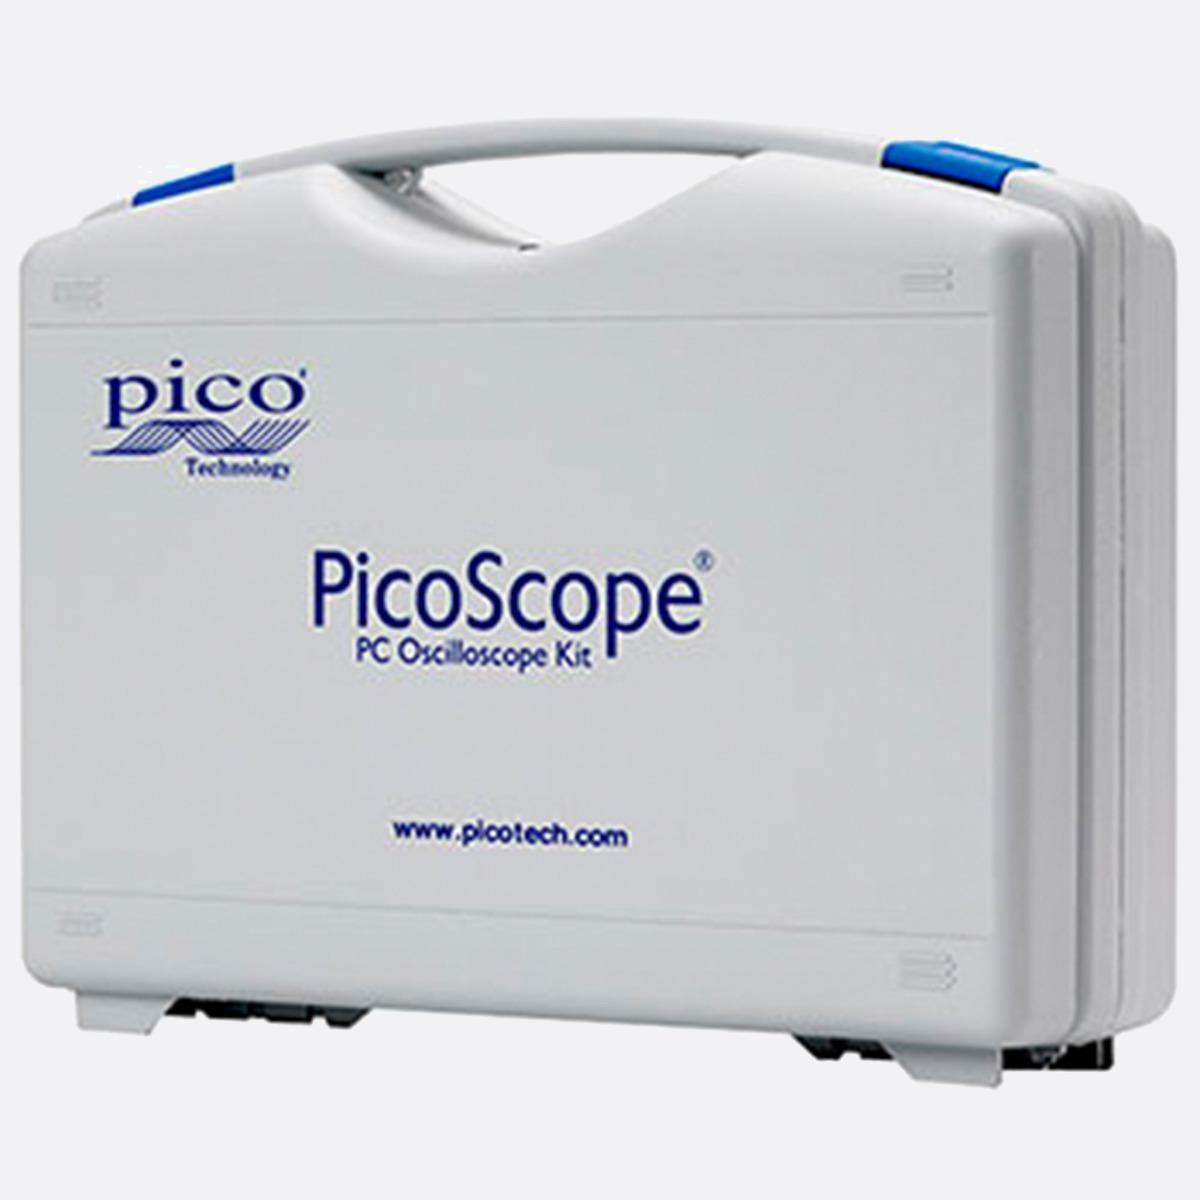 Pico_MI136_front_Ccontrols